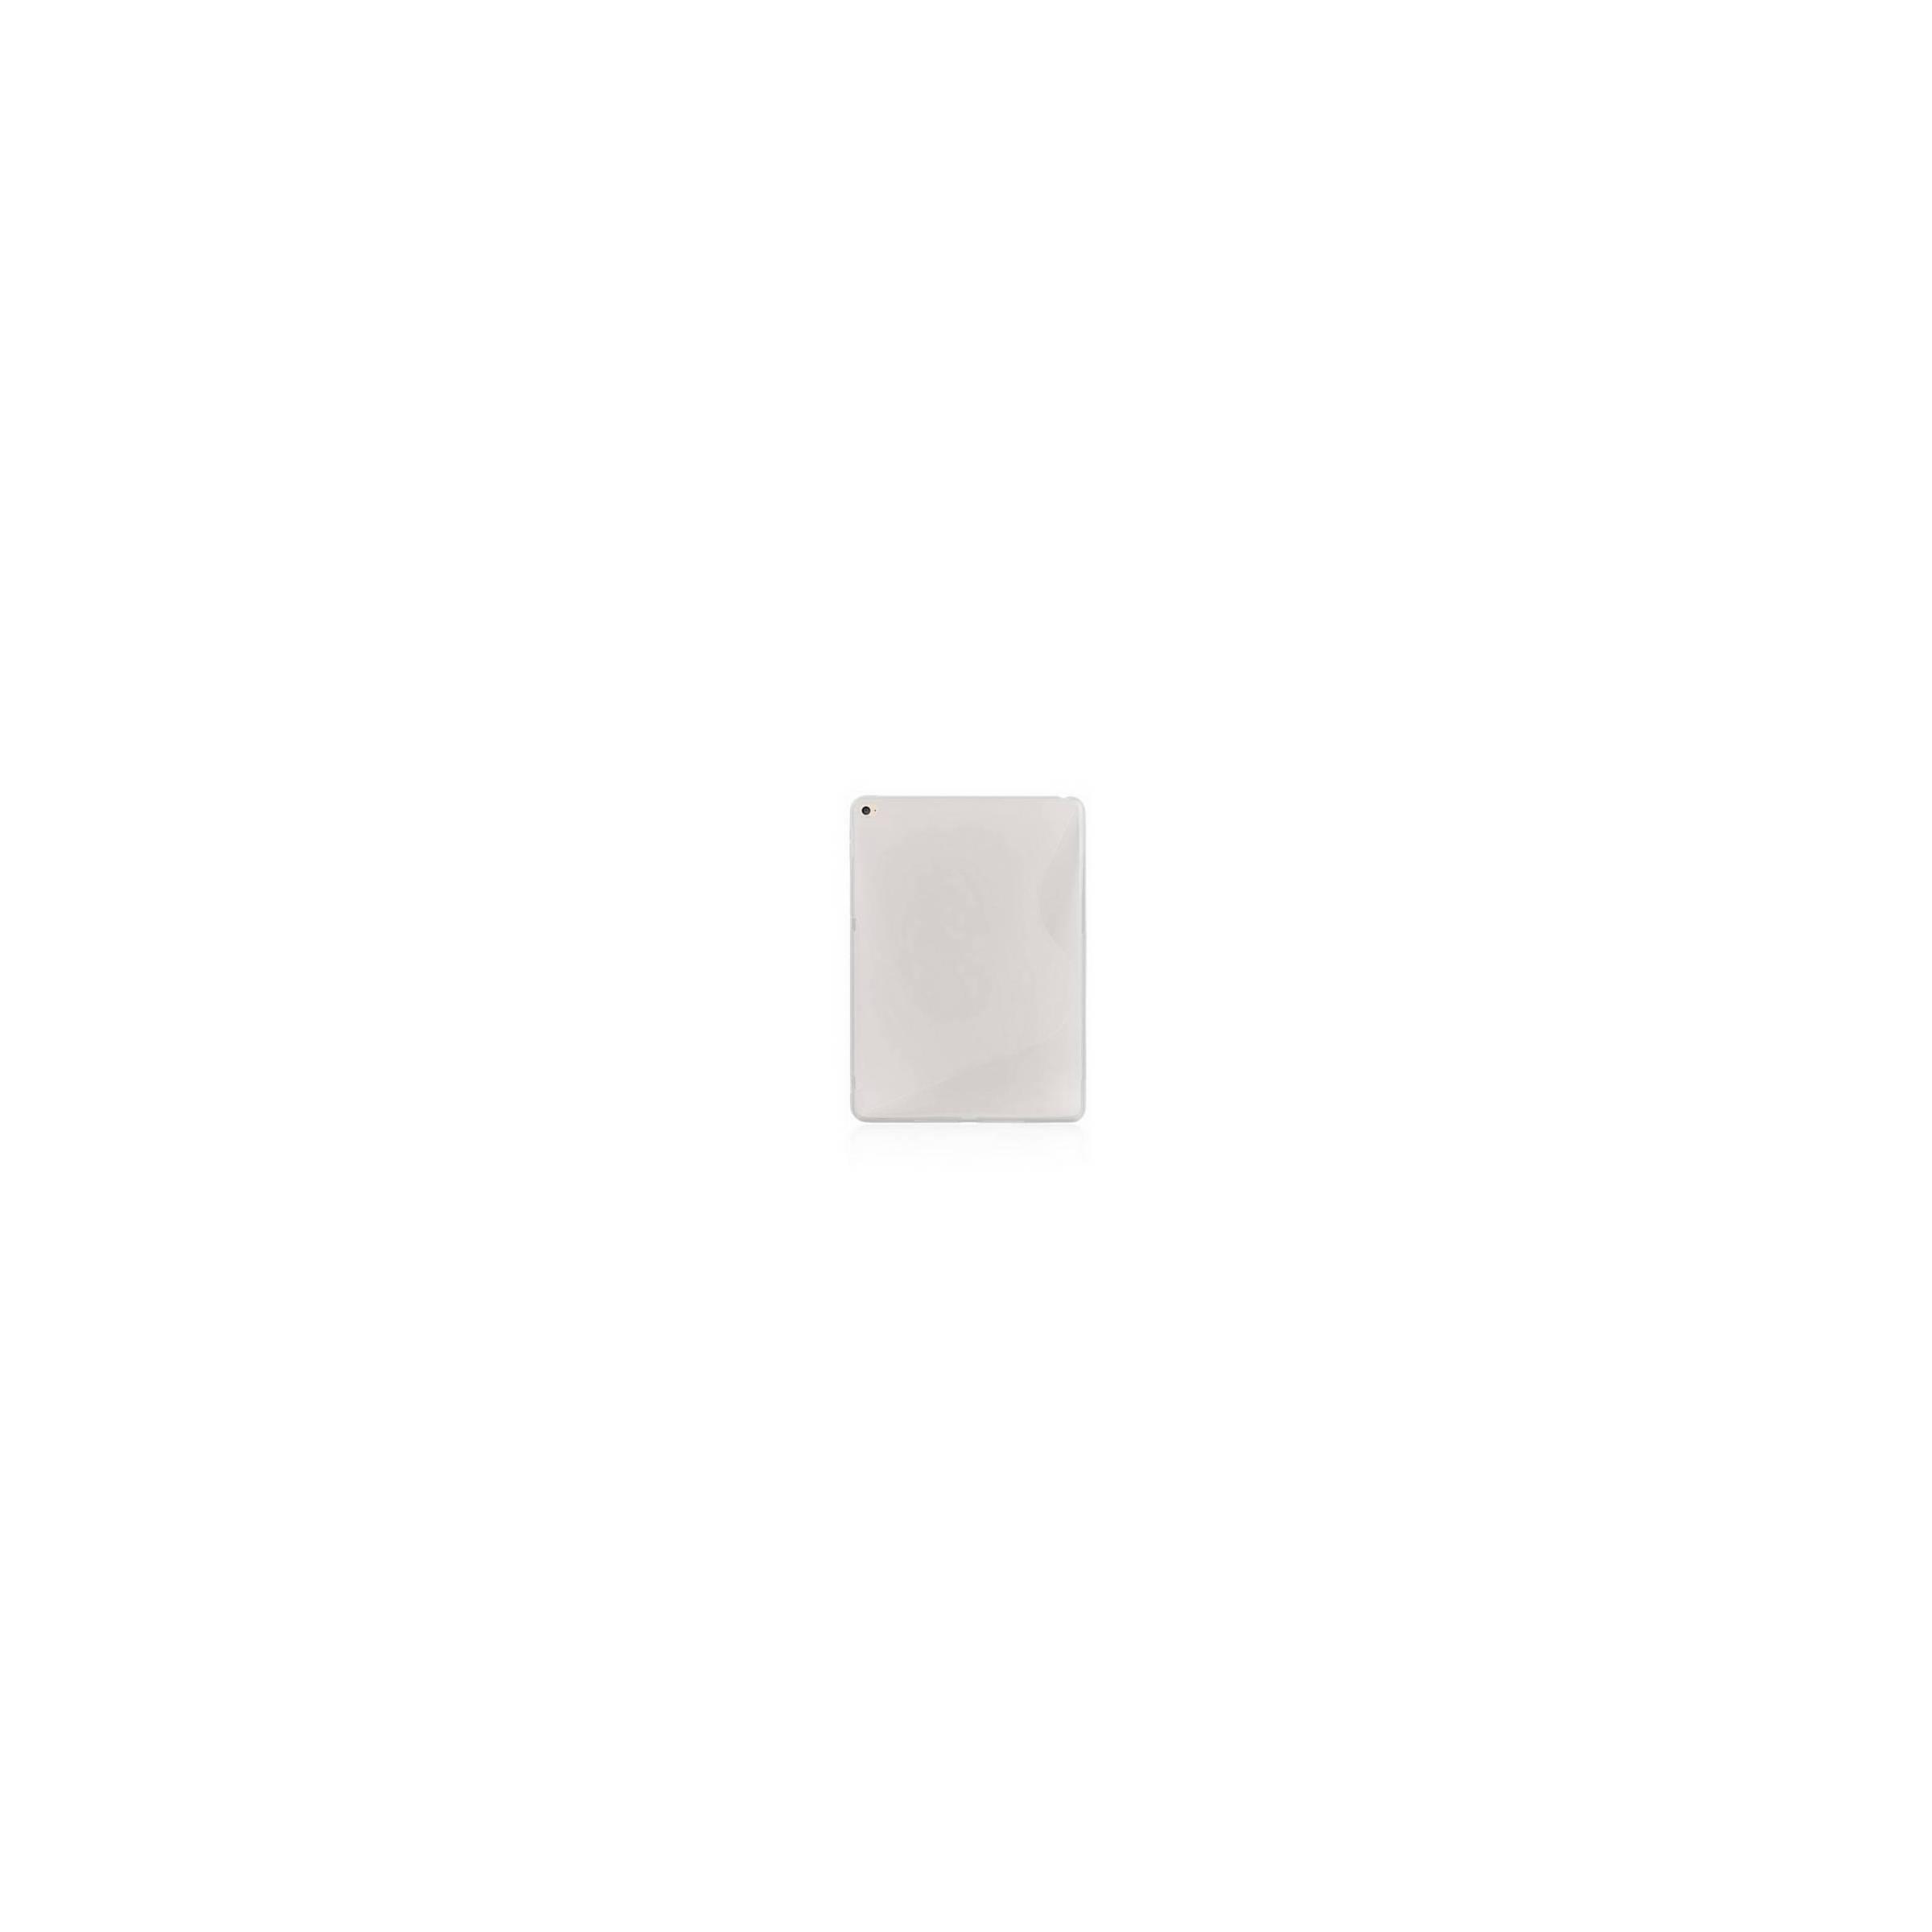 haweel – Ipad air 2 silikone cover farve hvid på mackabler.dk